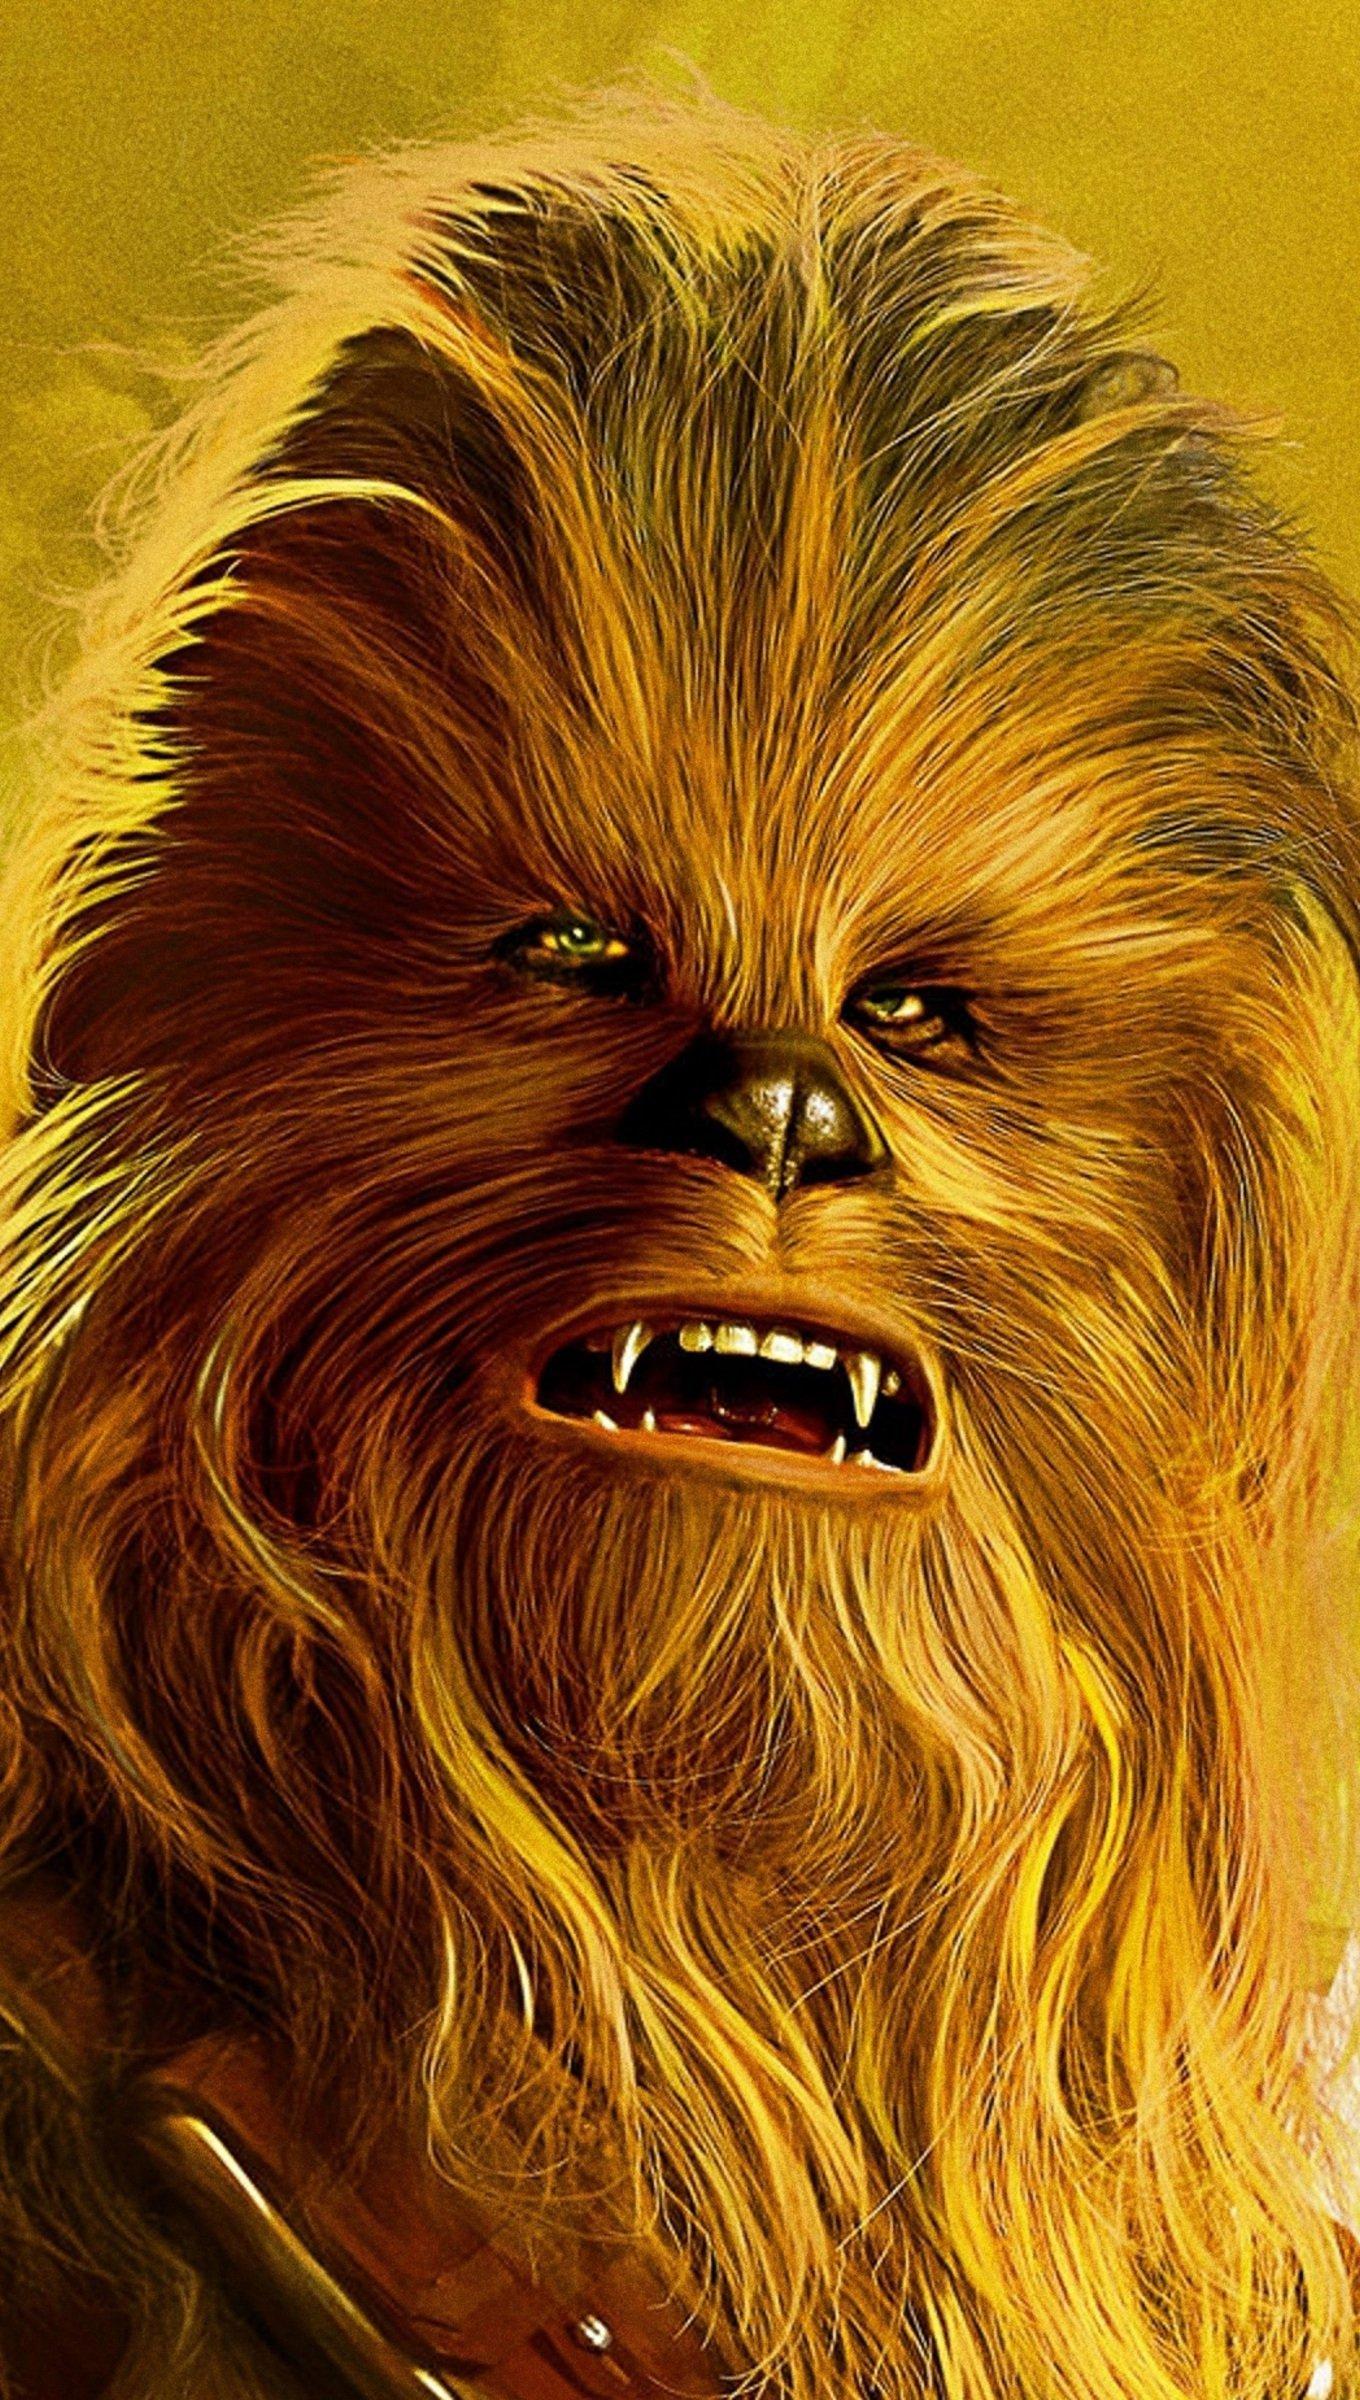 Fondos de pantalla Chewbacca de Star Wars Vertical